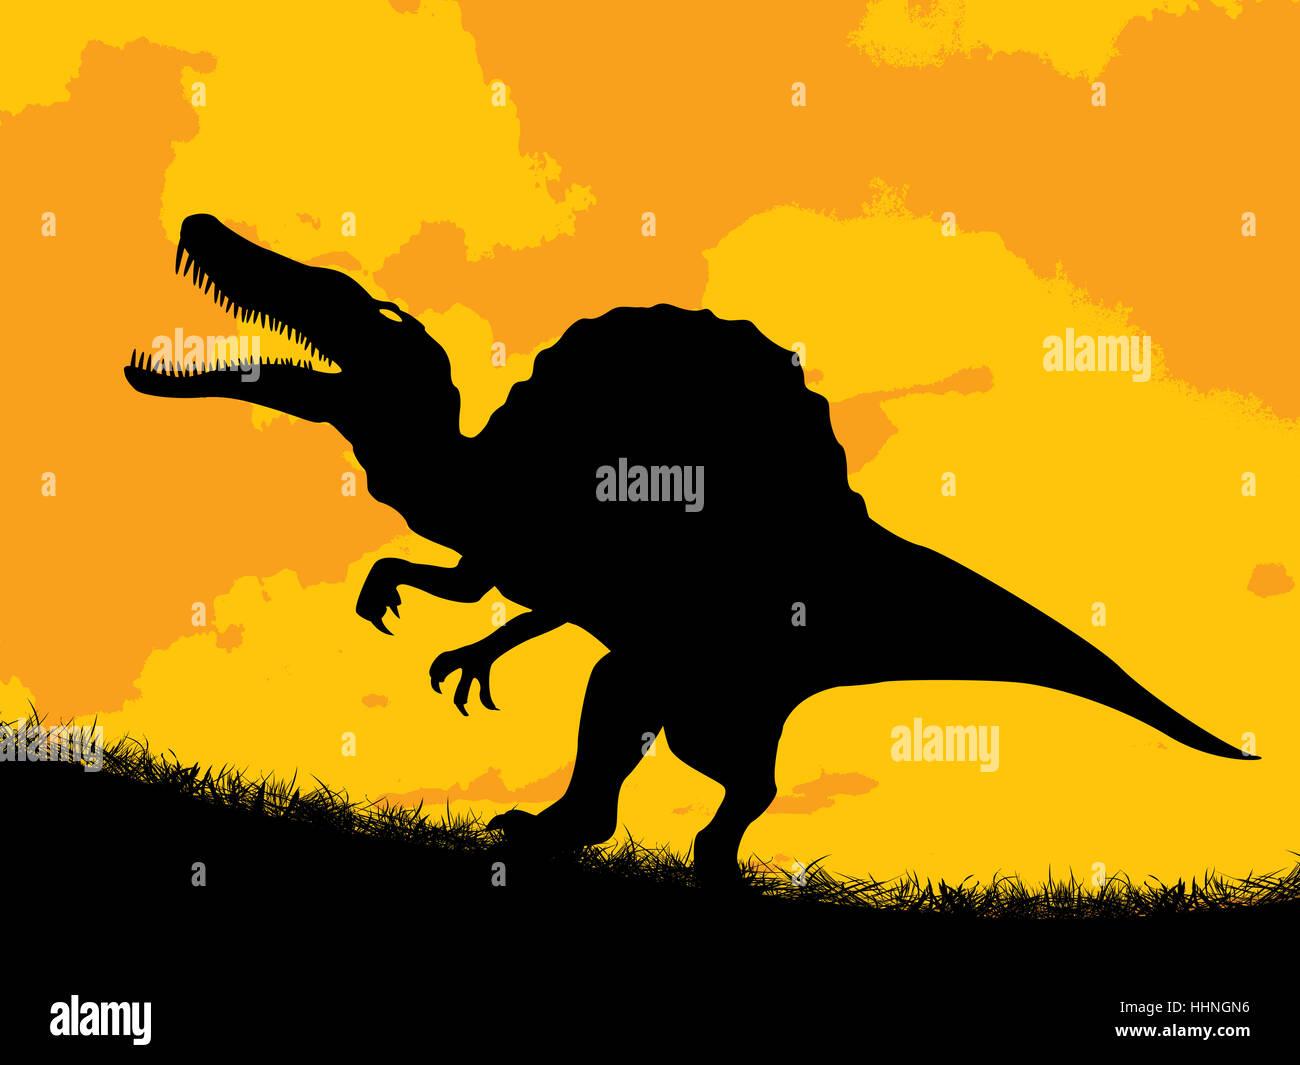 reptile, panic, predator, tooth, prehistory, prehistoric, white, close, big, - Stock Image